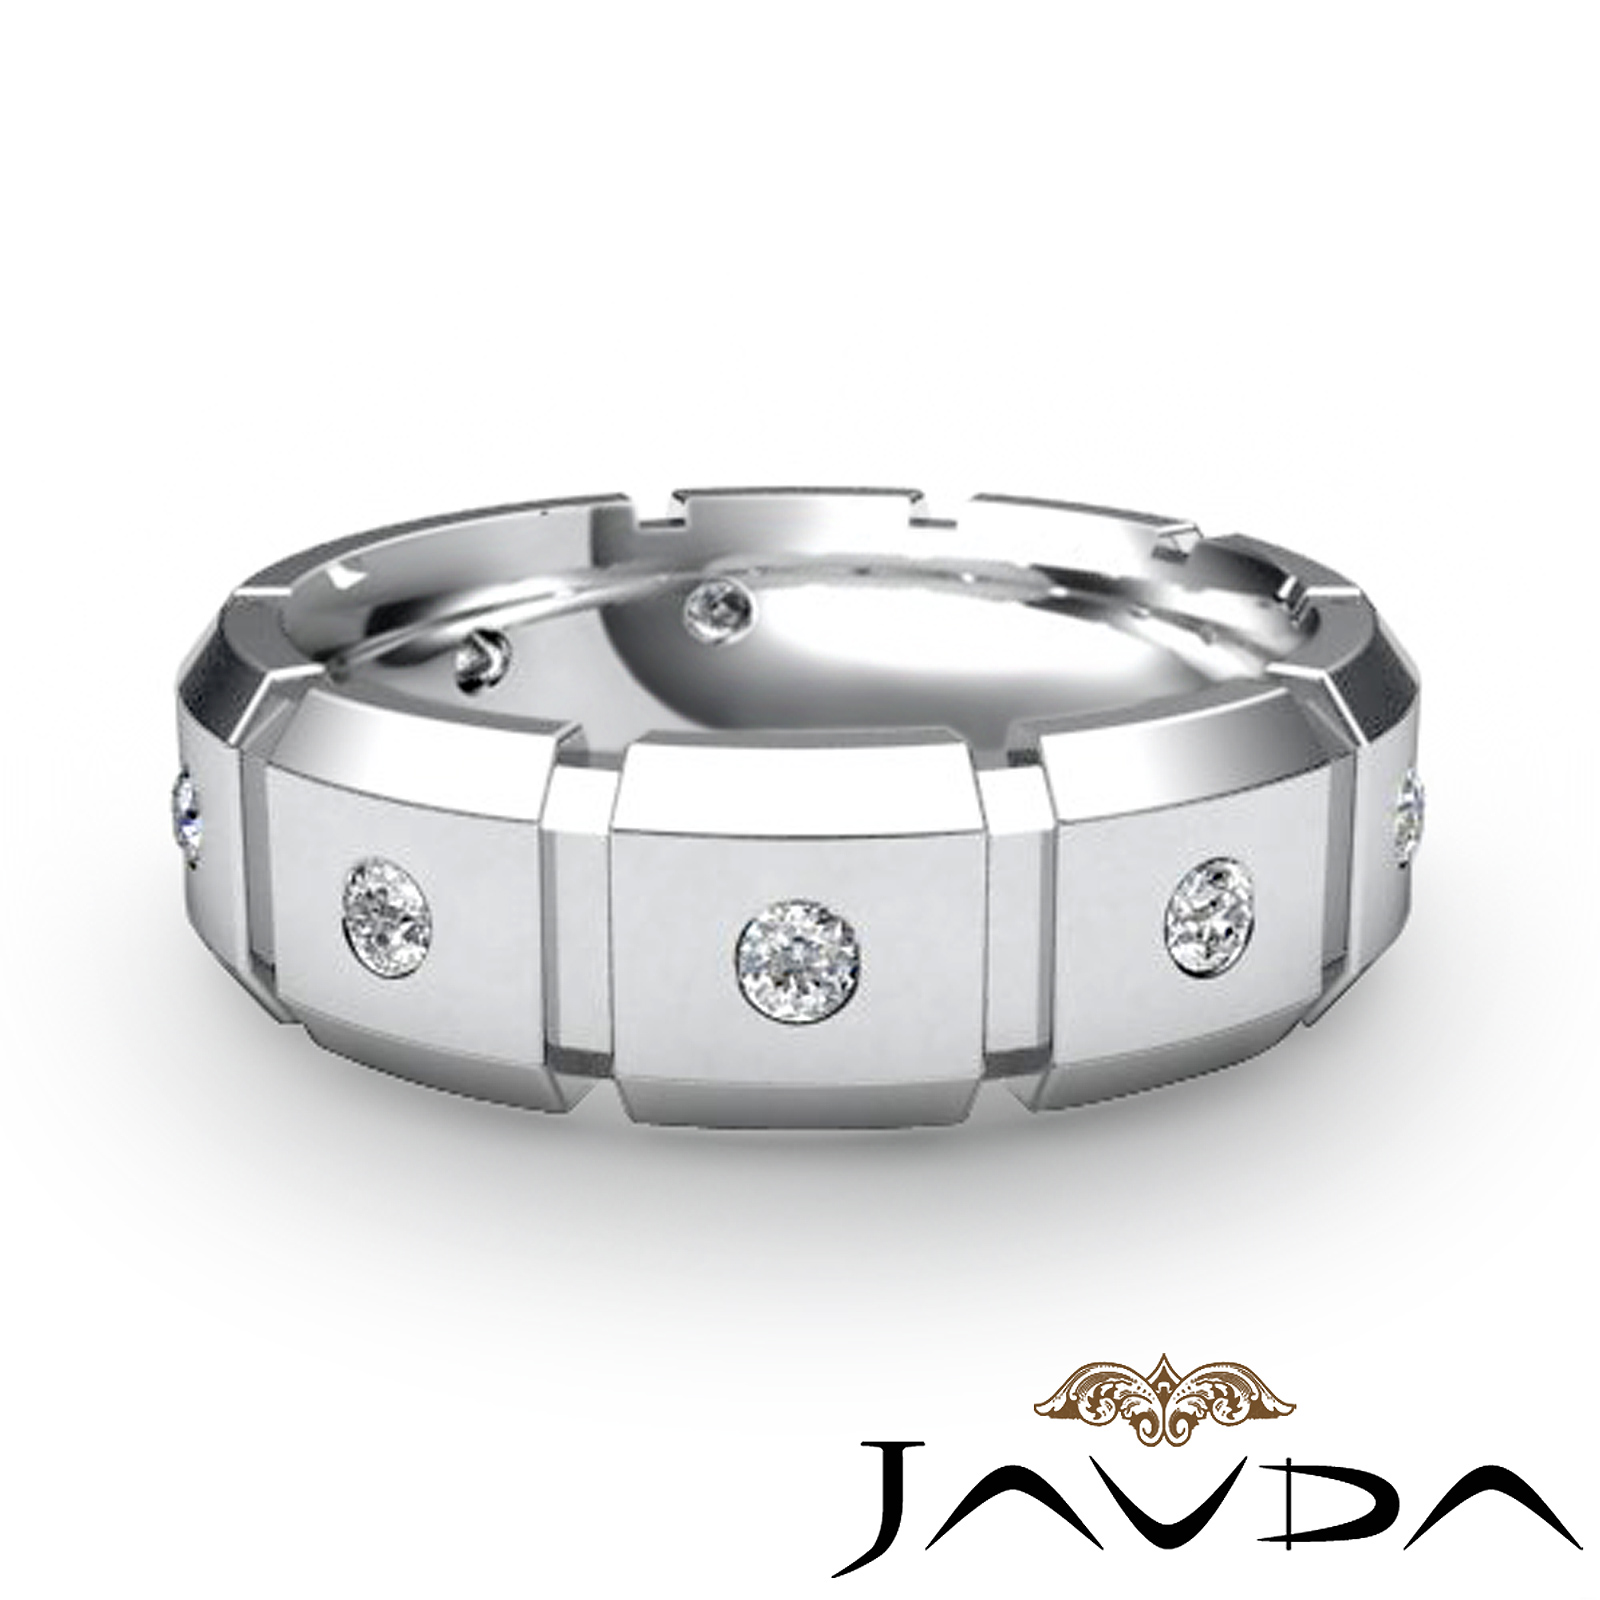 round diamond ring men block link eternity wedding band 14k white gold ebay. Black Bedroom Furniture Sets. Home Design Ideas